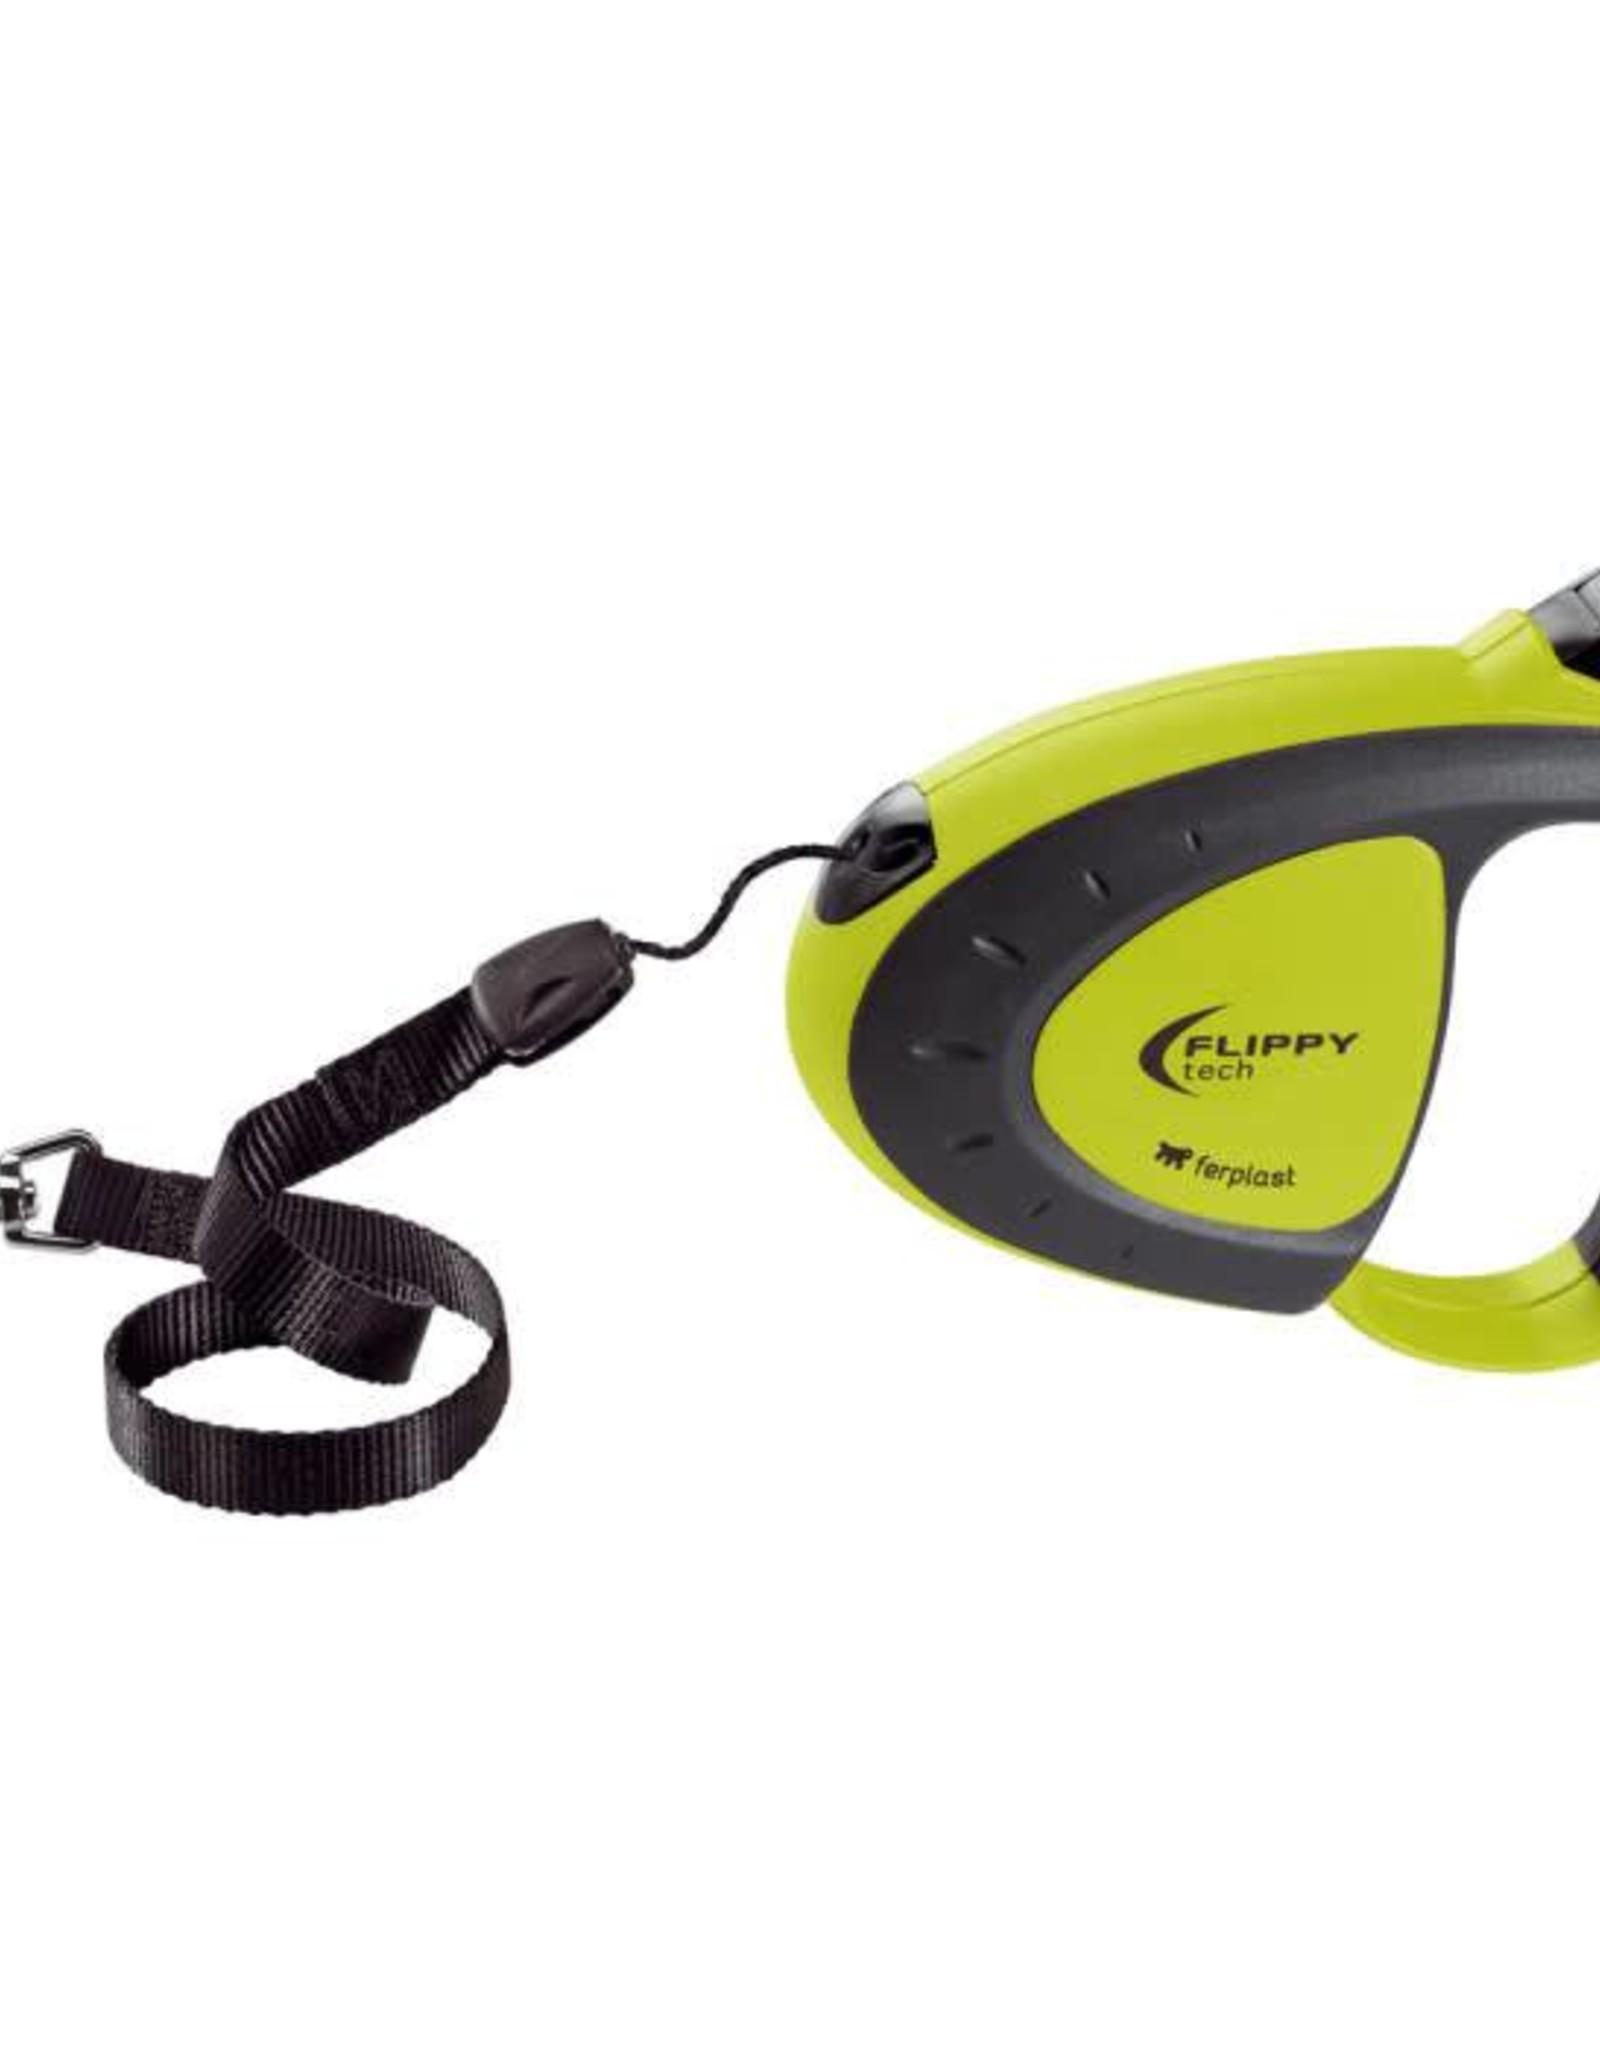 Ferplast Flippy Tech Retractable Cord Dog Lead, Small